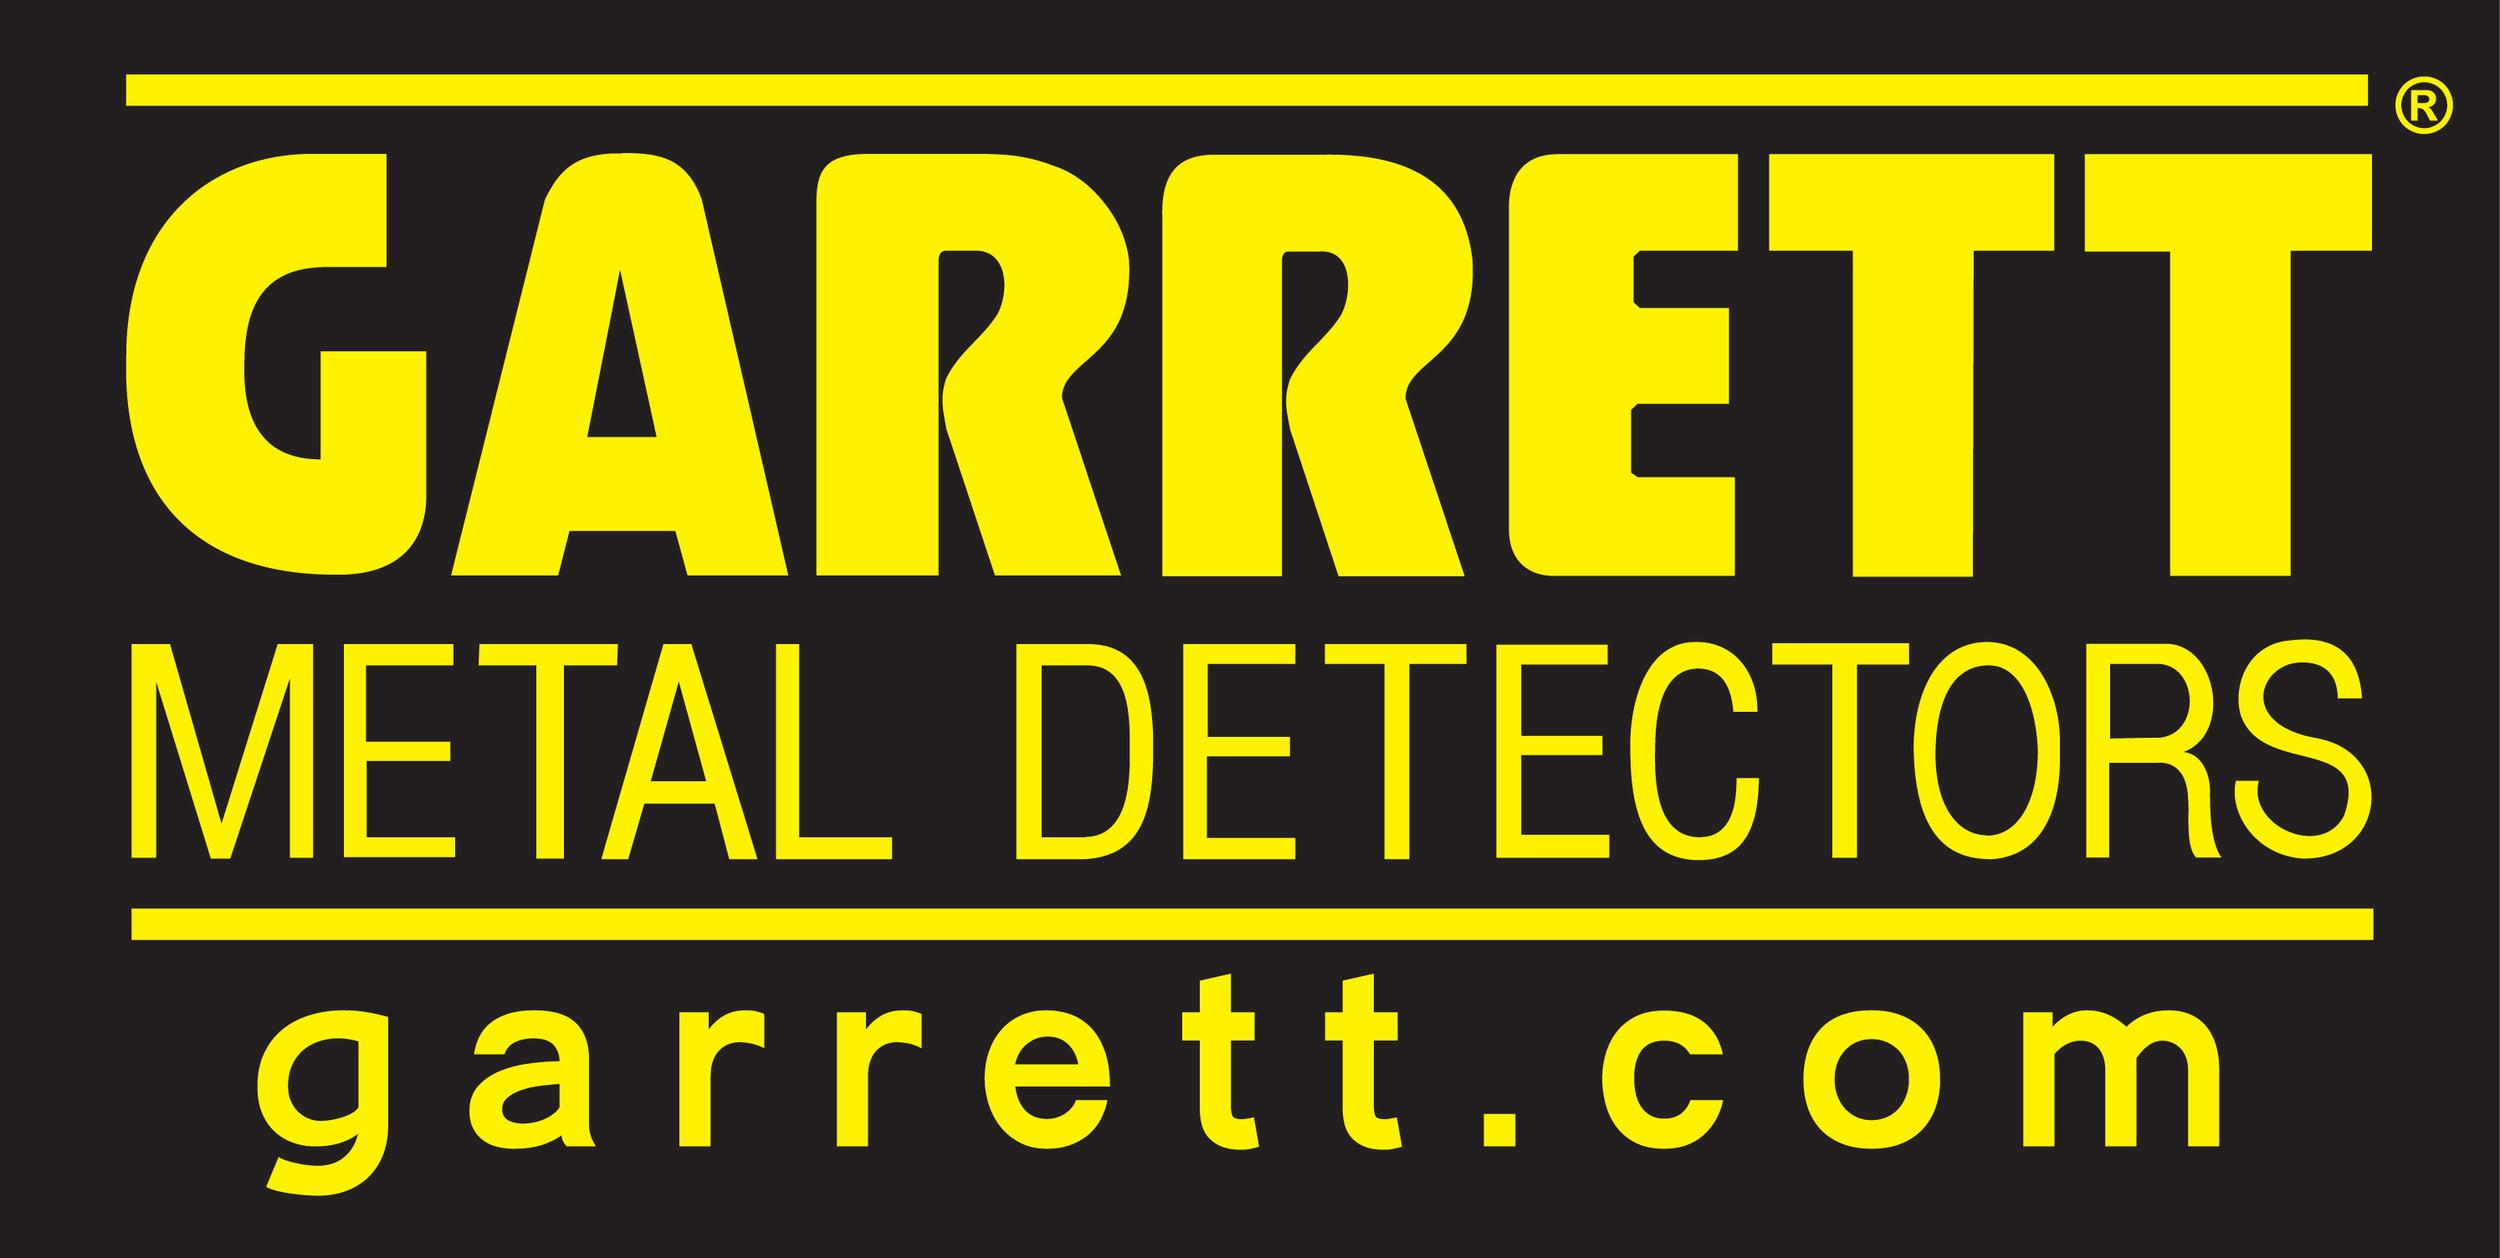 garrett logo_yellow_black.jpg